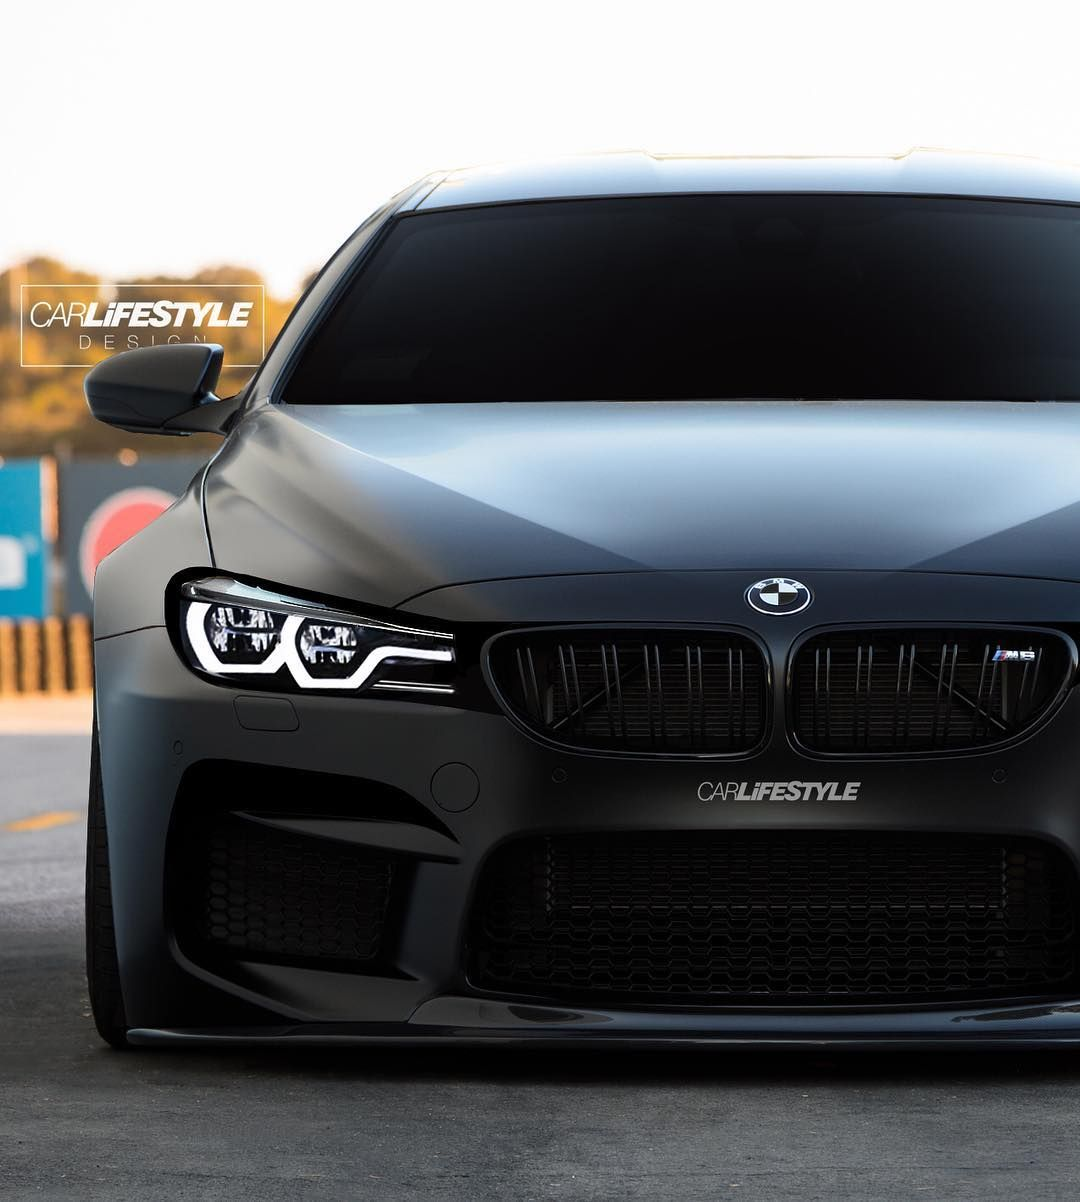 Repost Via Instagram: BMW ///M6 Facelift. Design By @gabe_carlifestyle A @carlifestyle Design